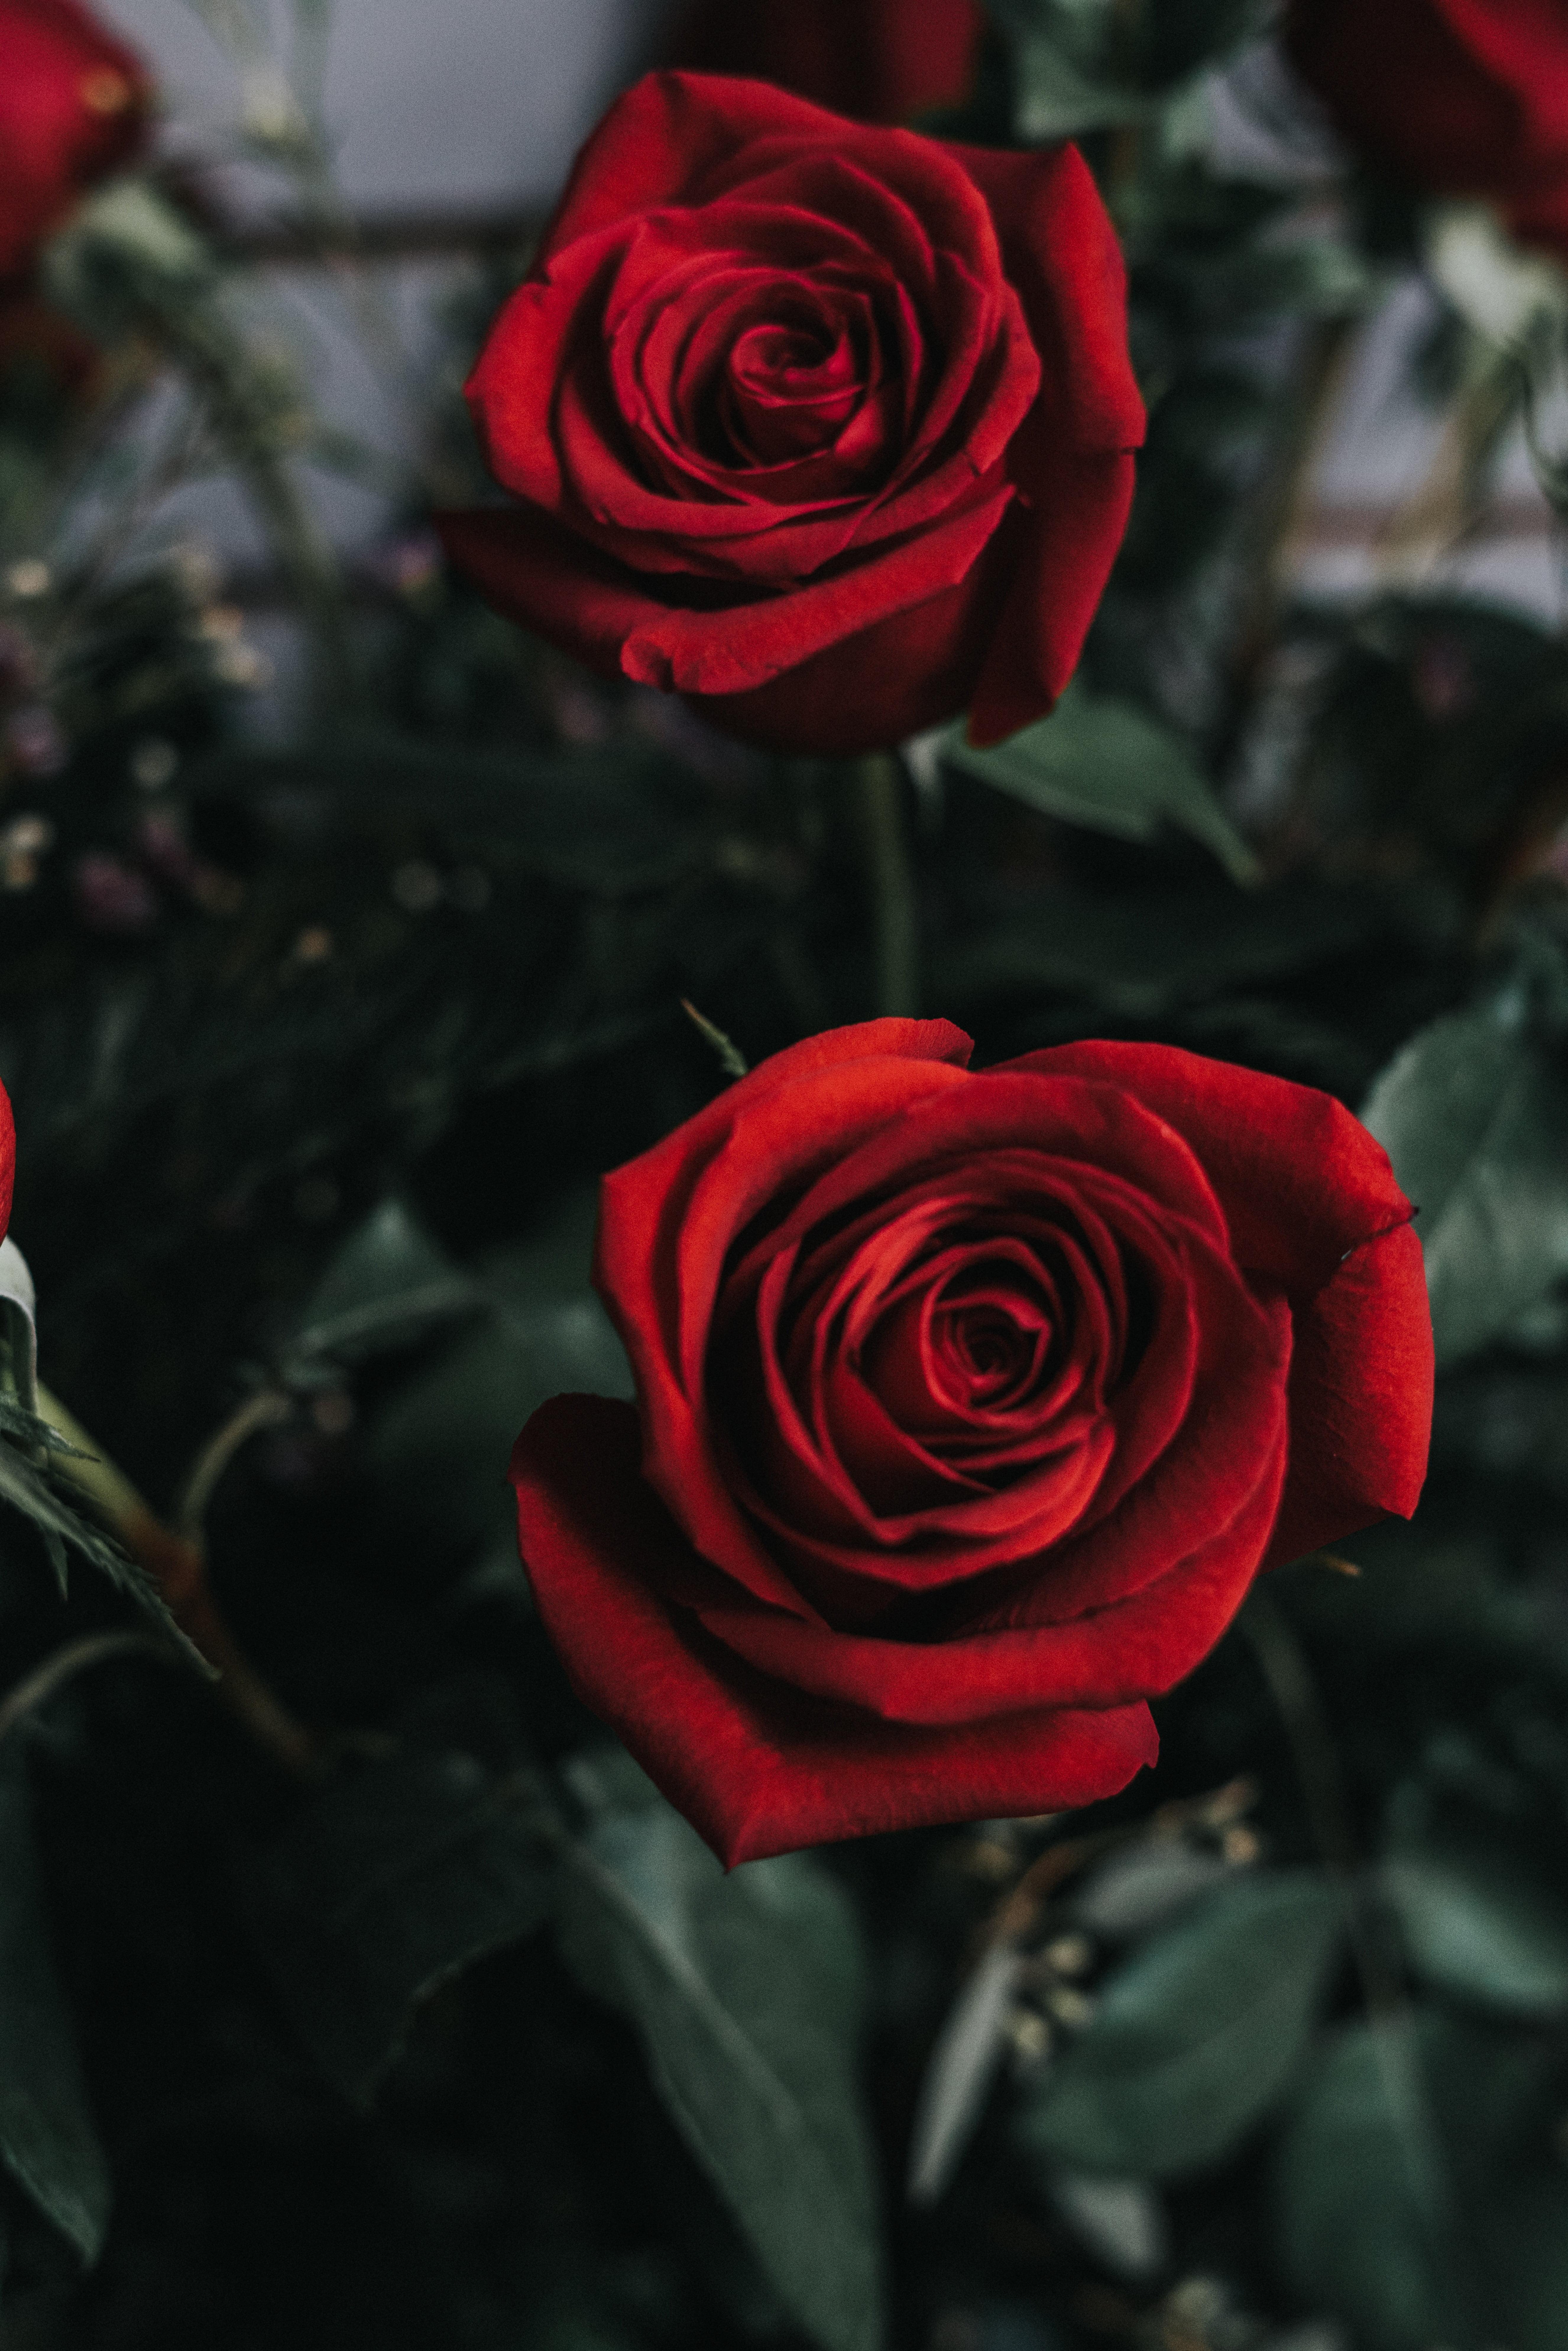 Red Flower Wallpaper - Rose Flower , HD Wallpaper & Backgrounds